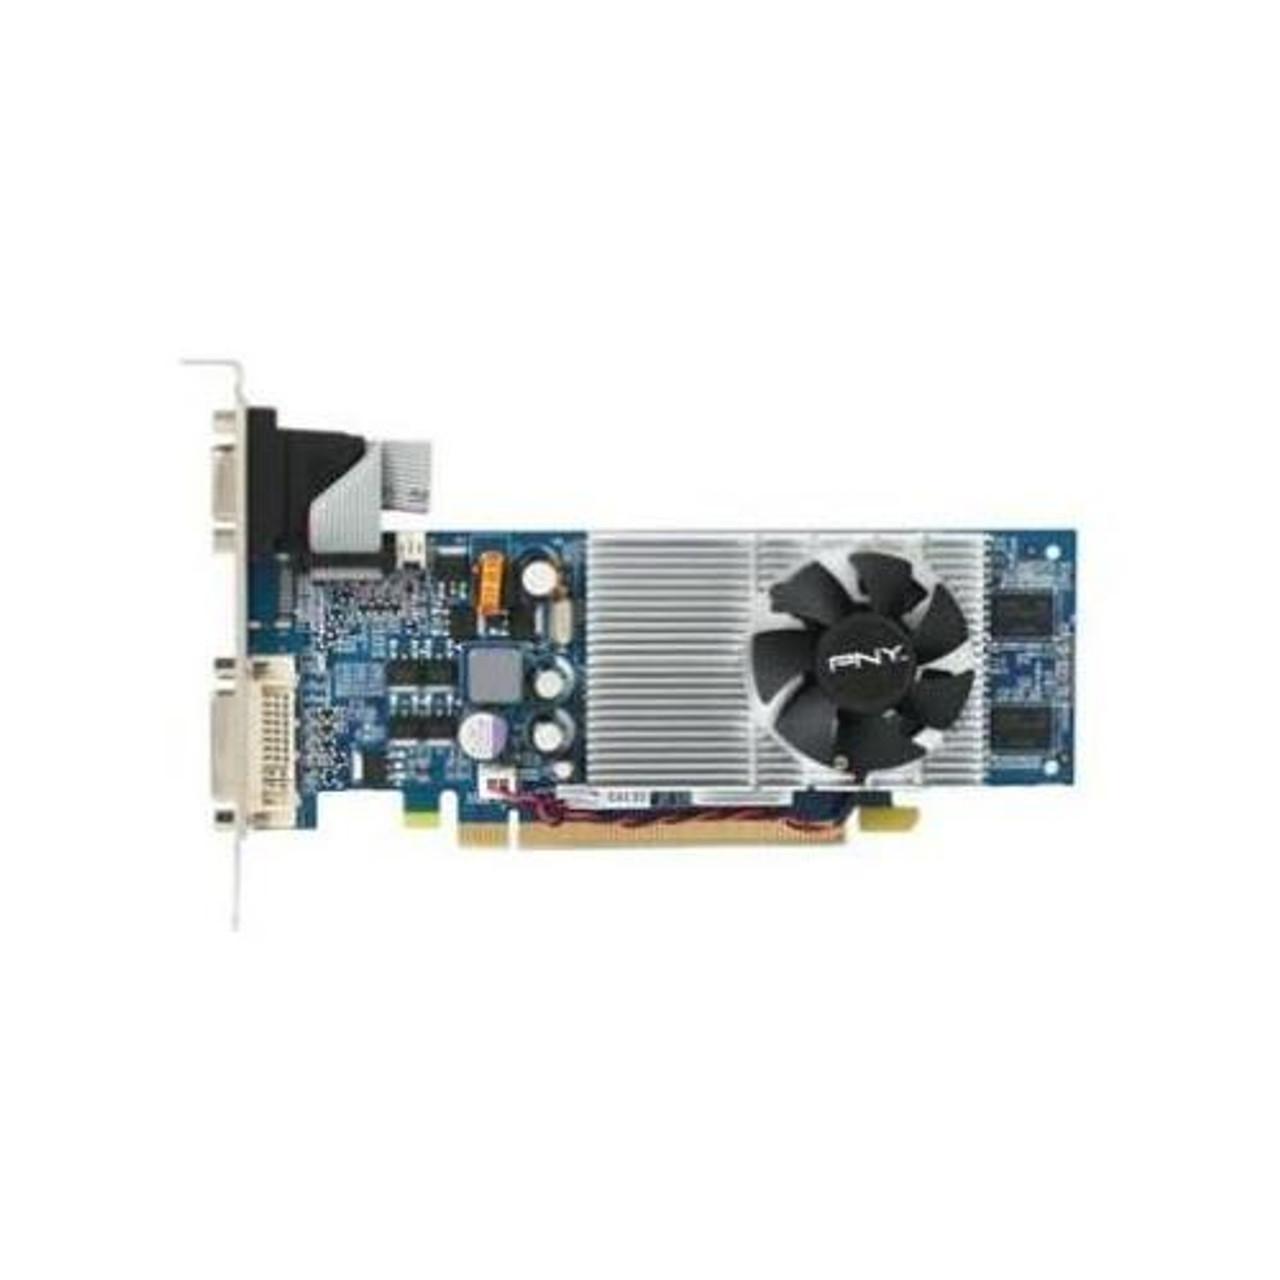 PNY NVS Quadro NVS 300 VCNVS300X1-PB 512MB DDR3 PCI Express x1 Graphics Card